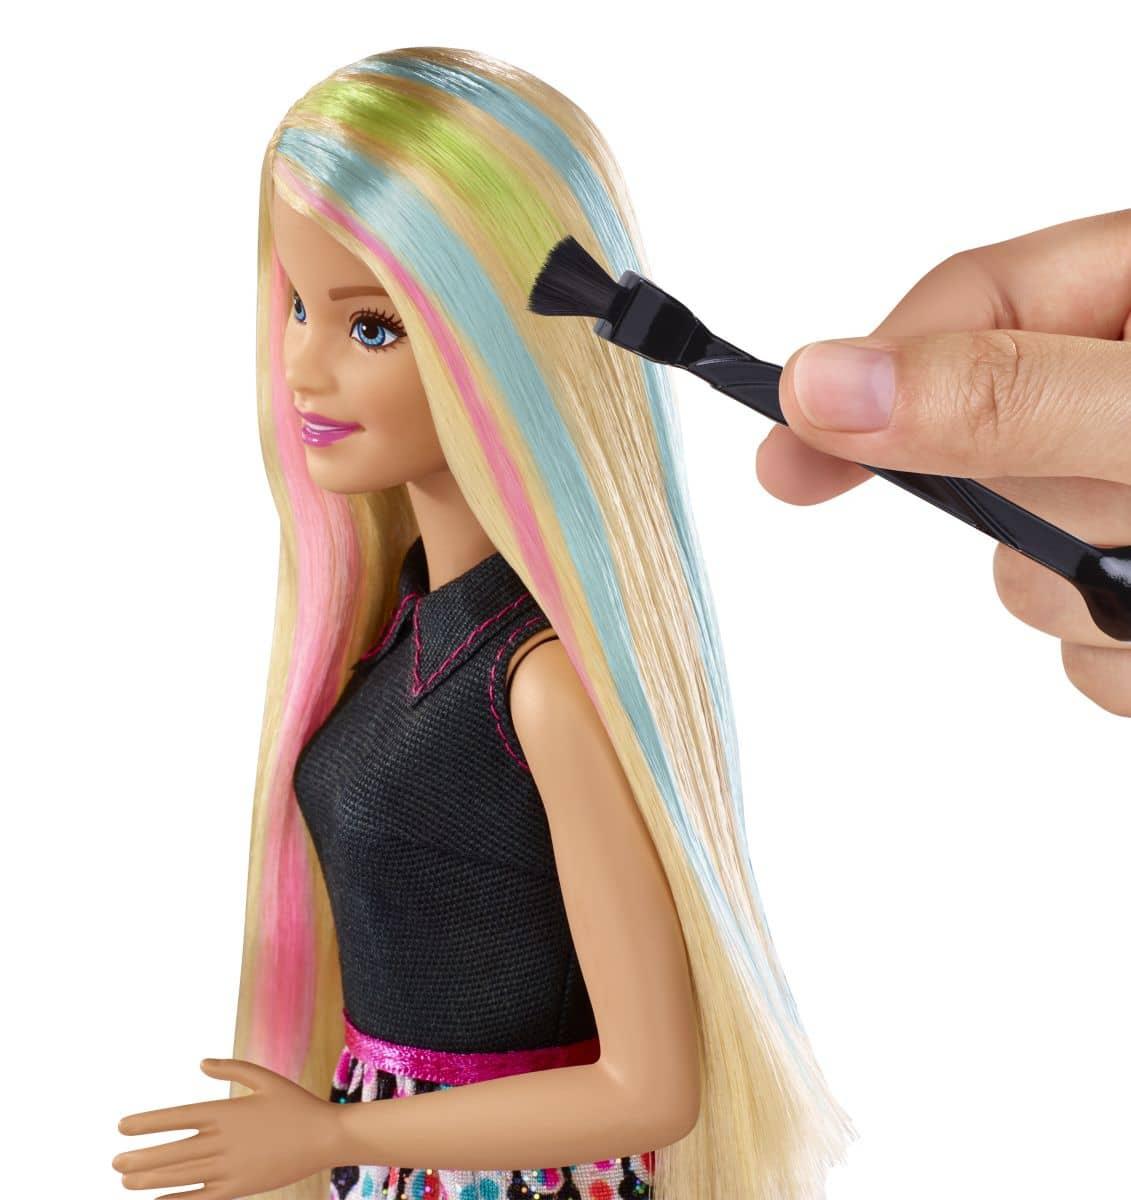 barbie filme kaufen